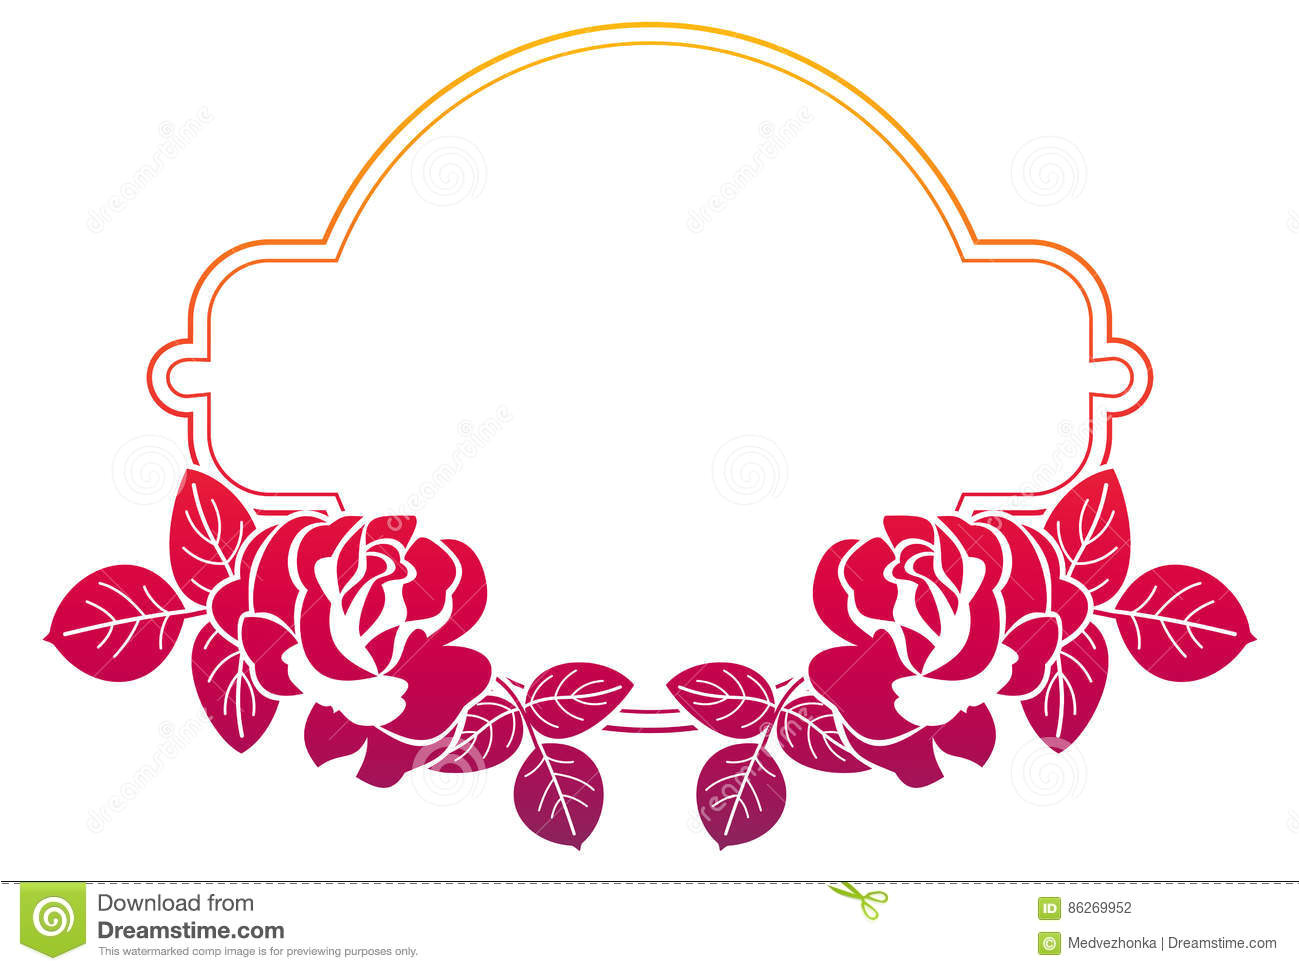 gradient frame roses raster clip art color advertisements wedding invitations greeting cards 86269952 jpg